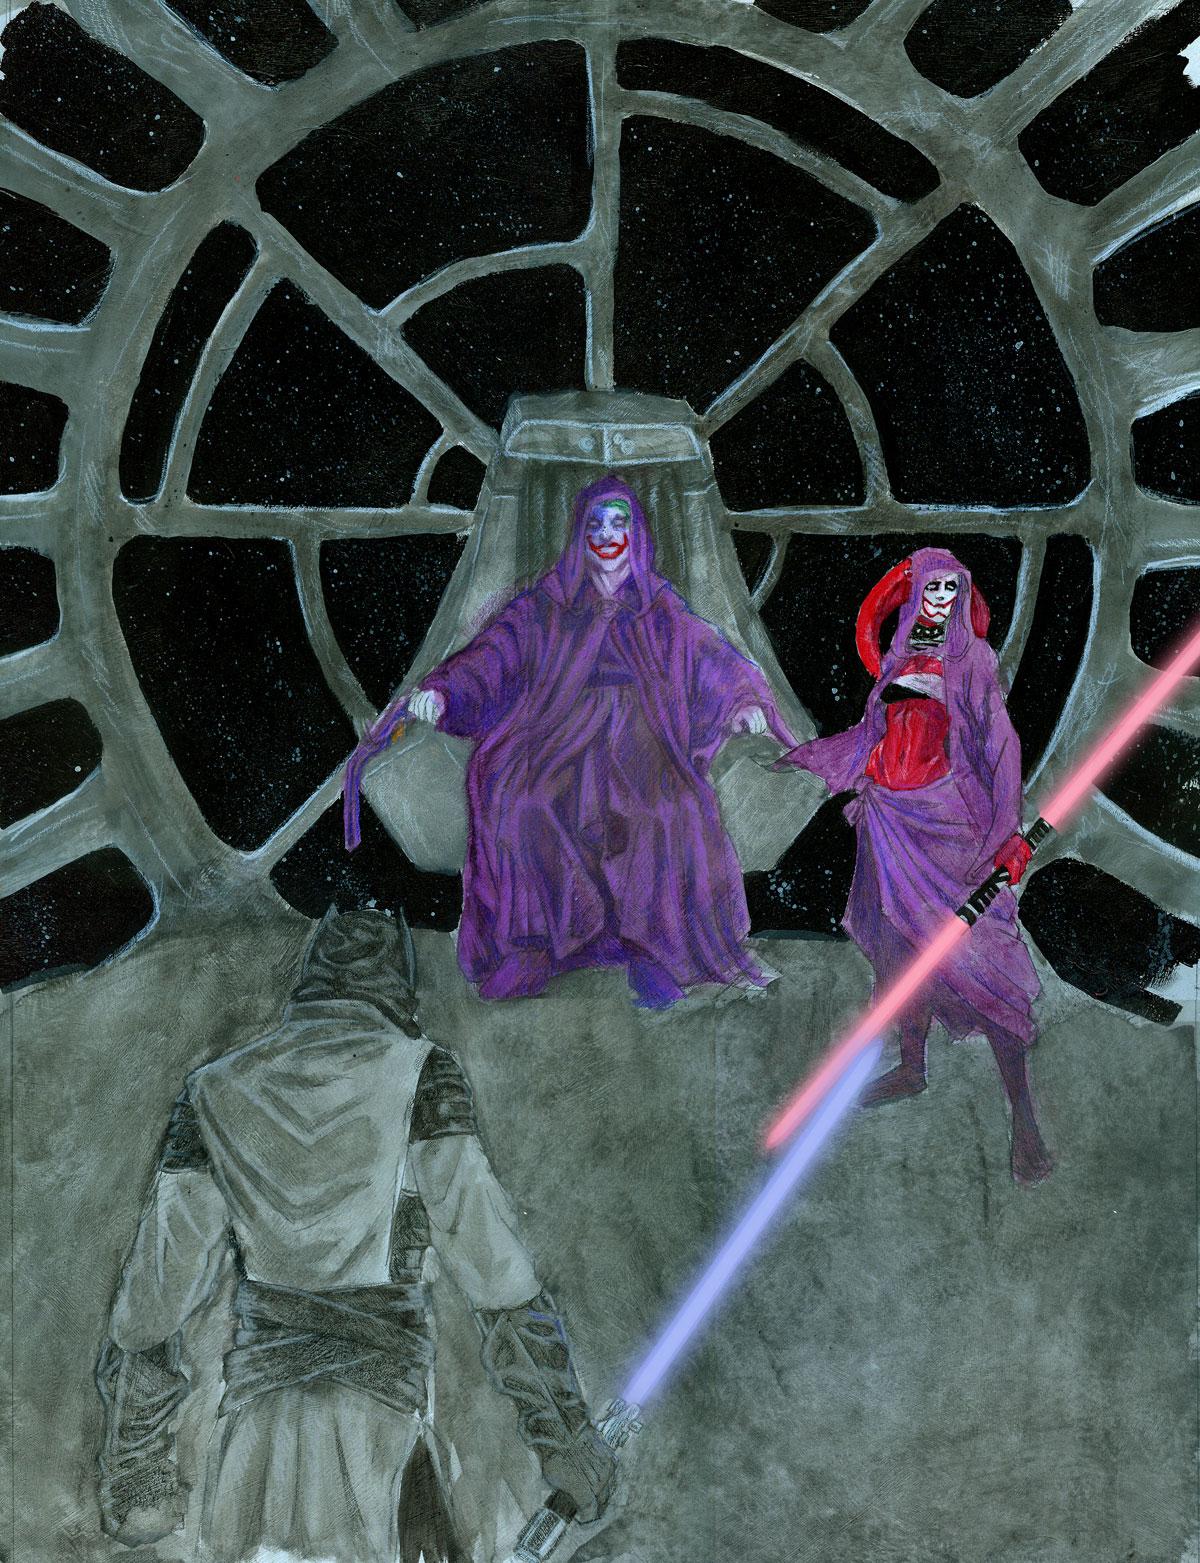 emperor joker harley quinn twi'lek batman jedi lightsaber